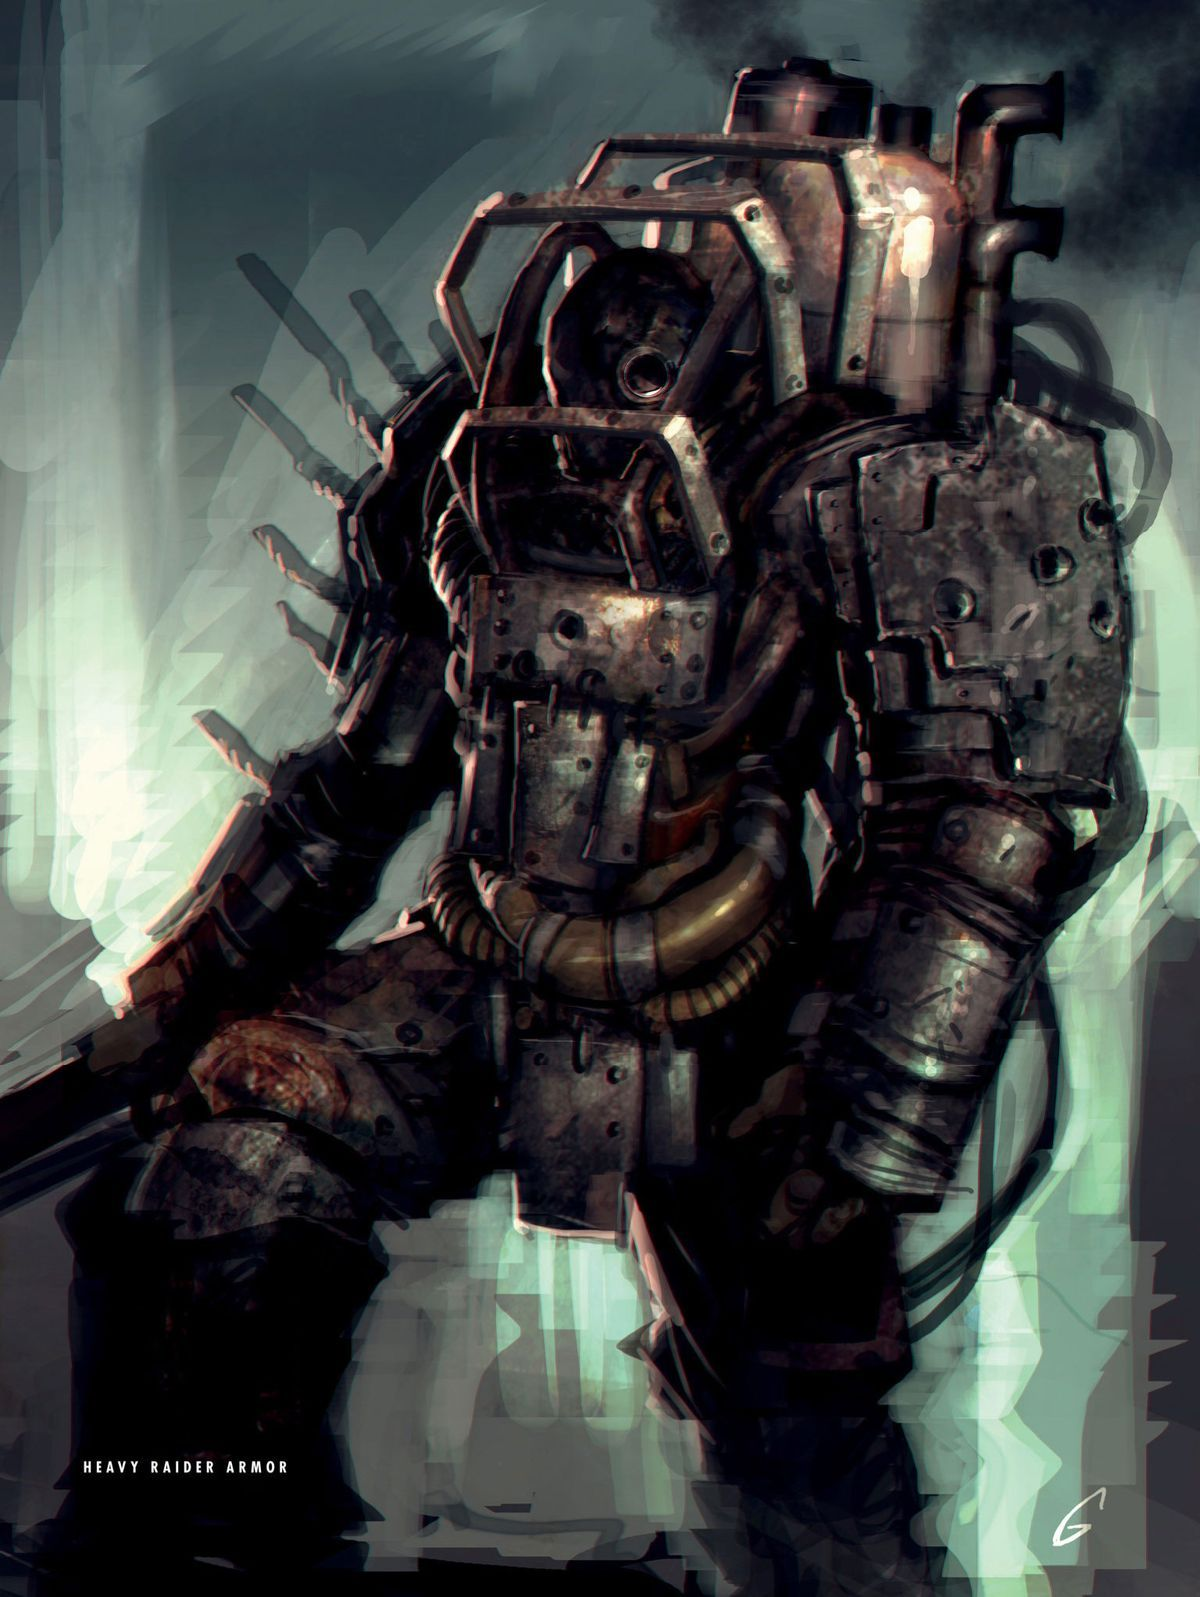 Fallout 4 Heavy Raider Armor Fallout Raider Fallout Concept Art Fallout Art